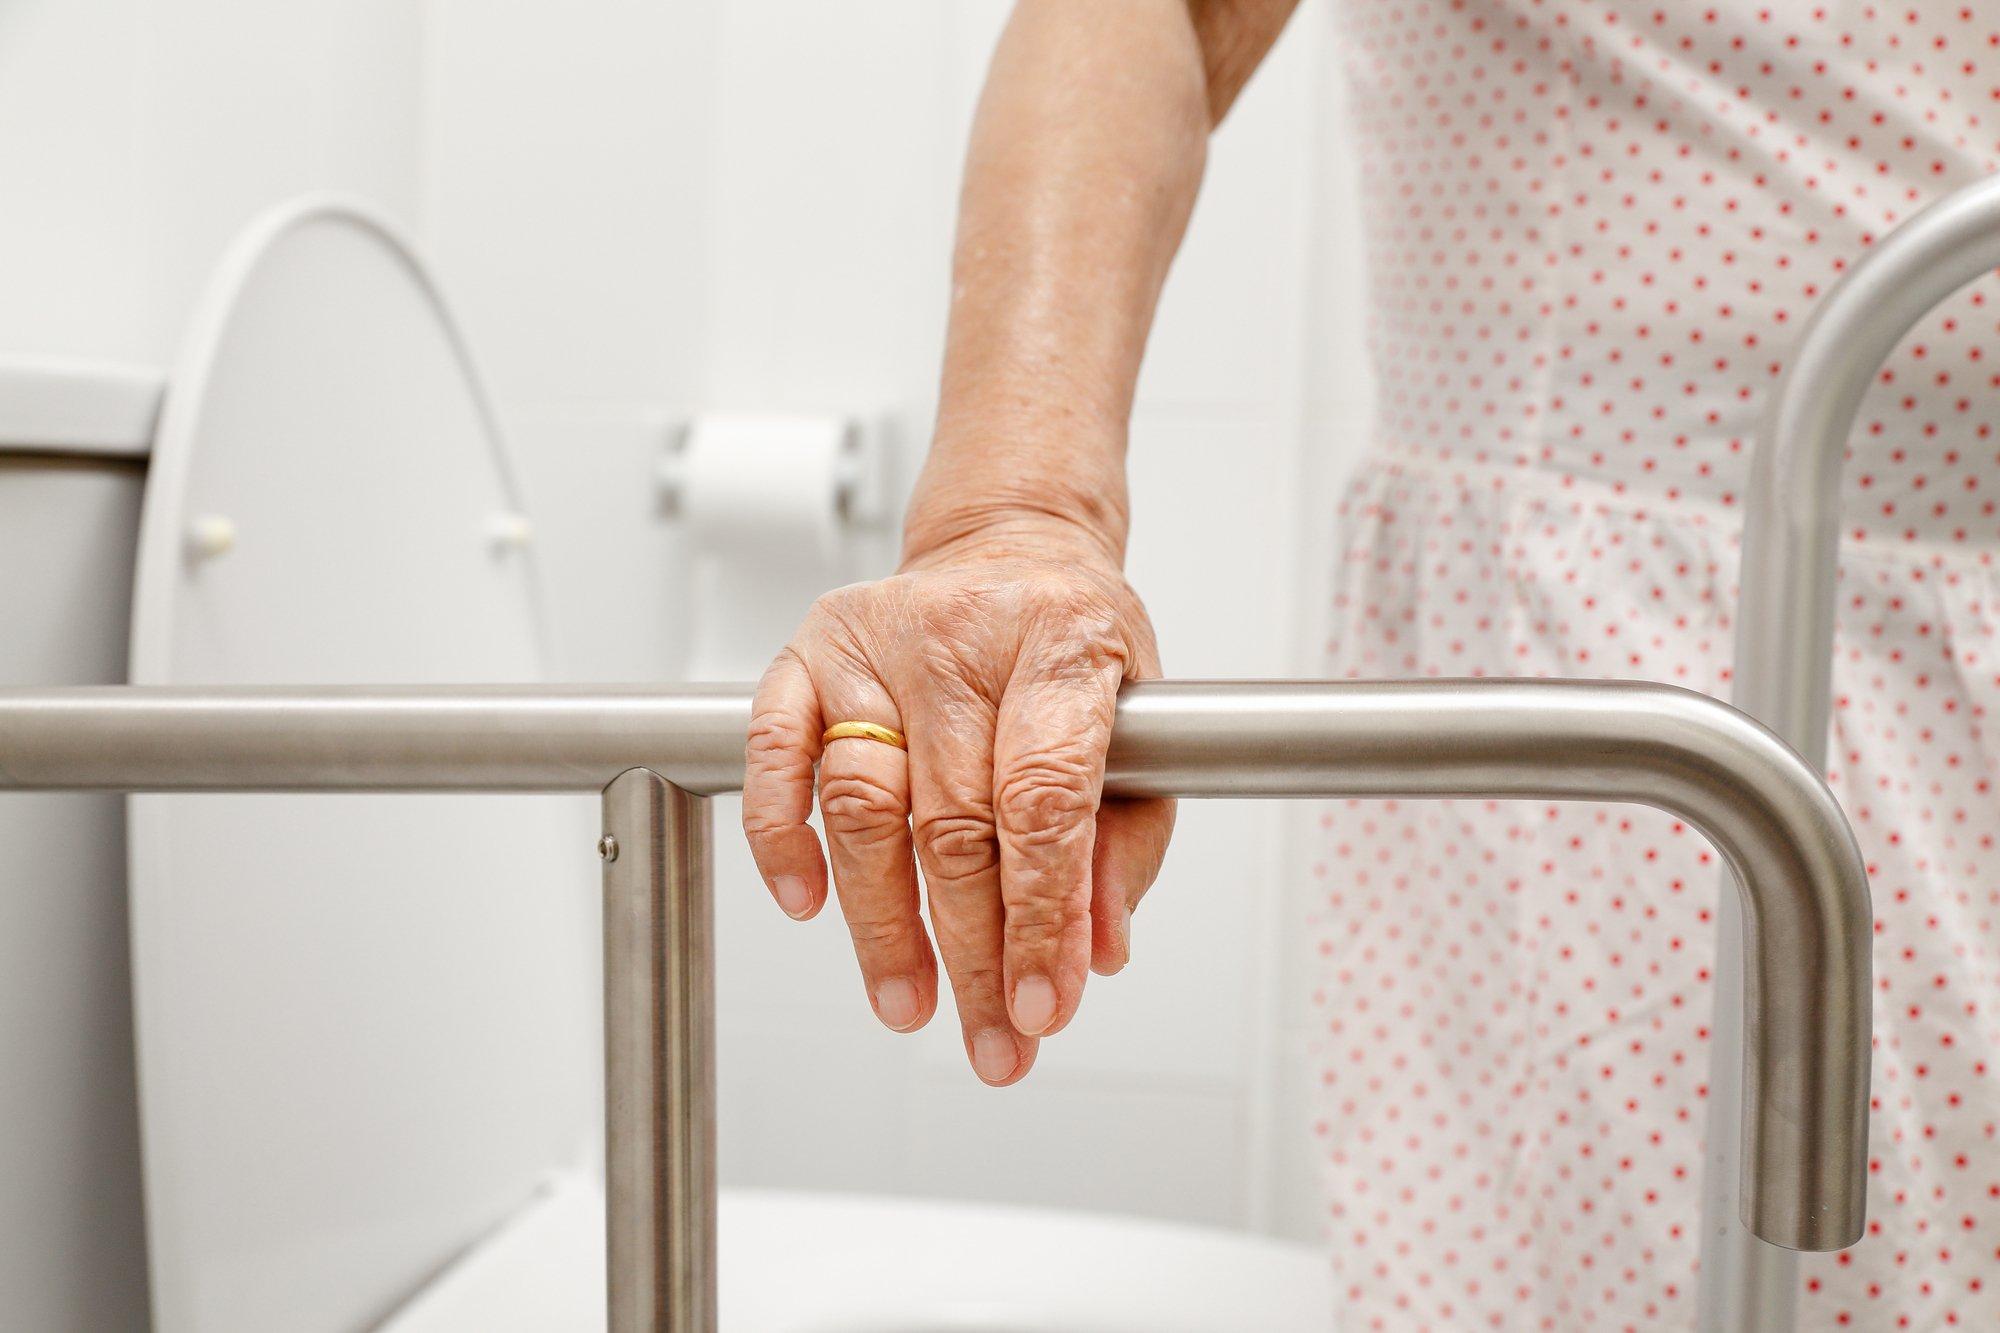 Elderly woman holding on handrail in toilet